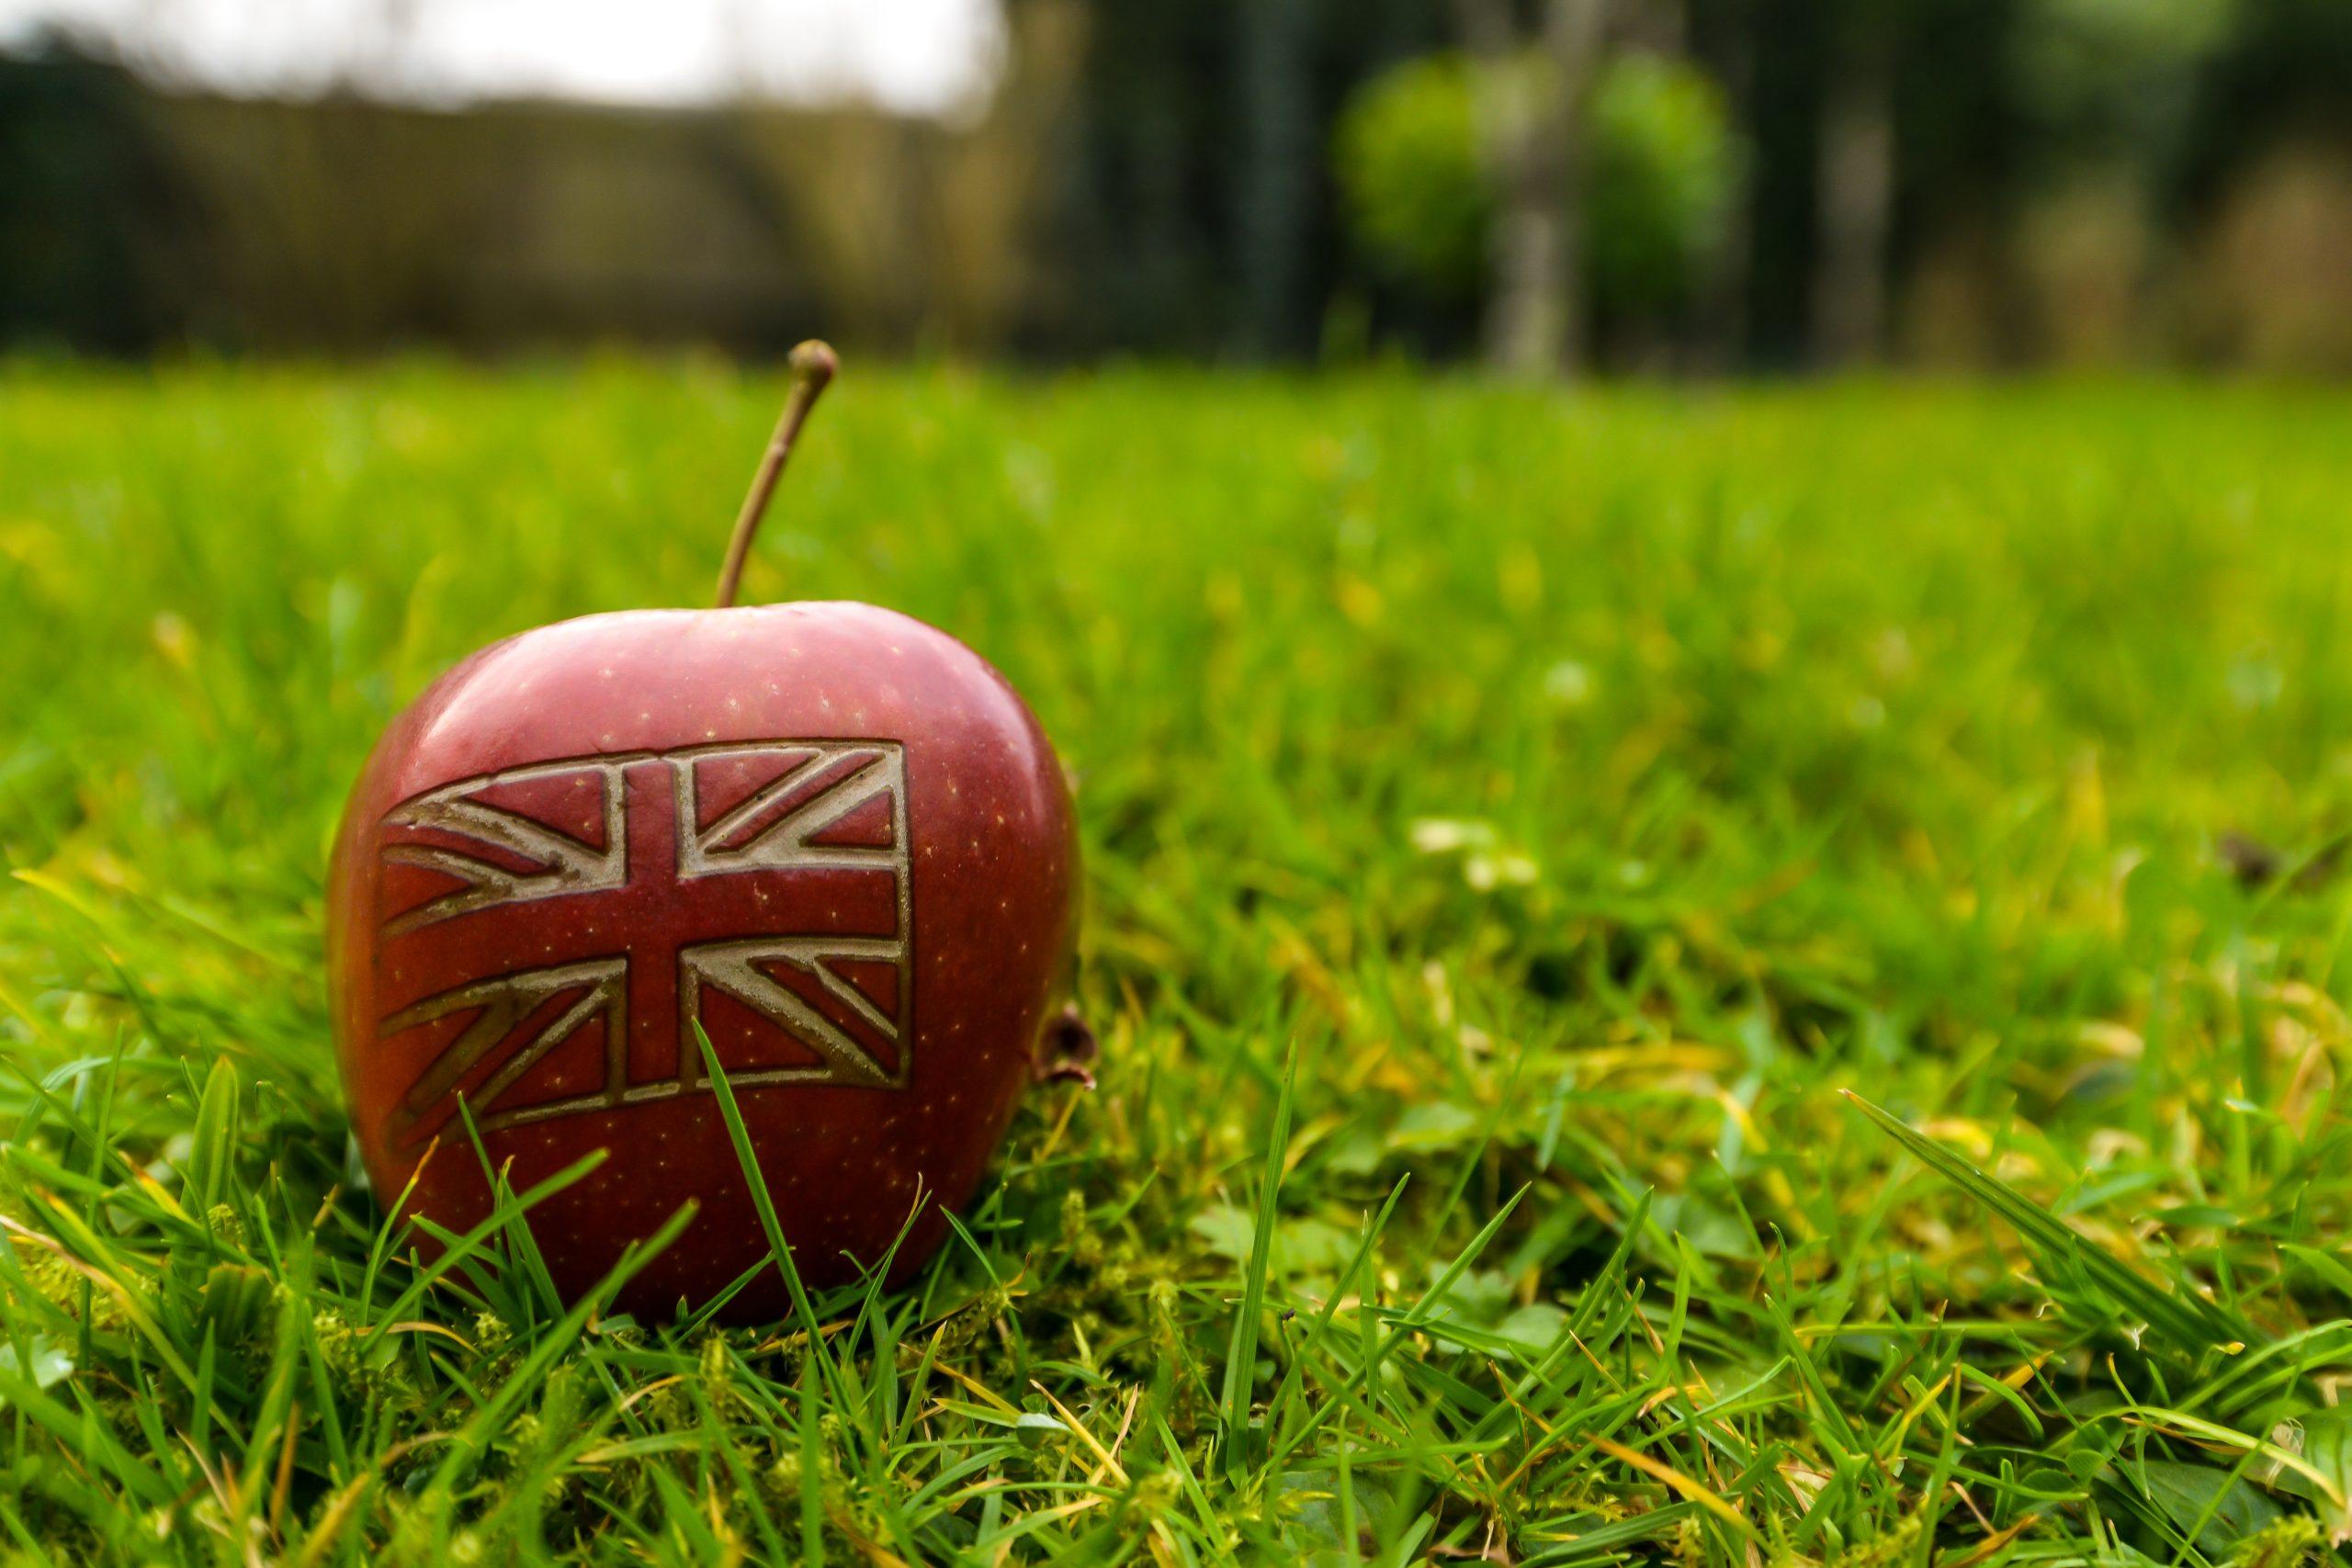 uk apples in season in February